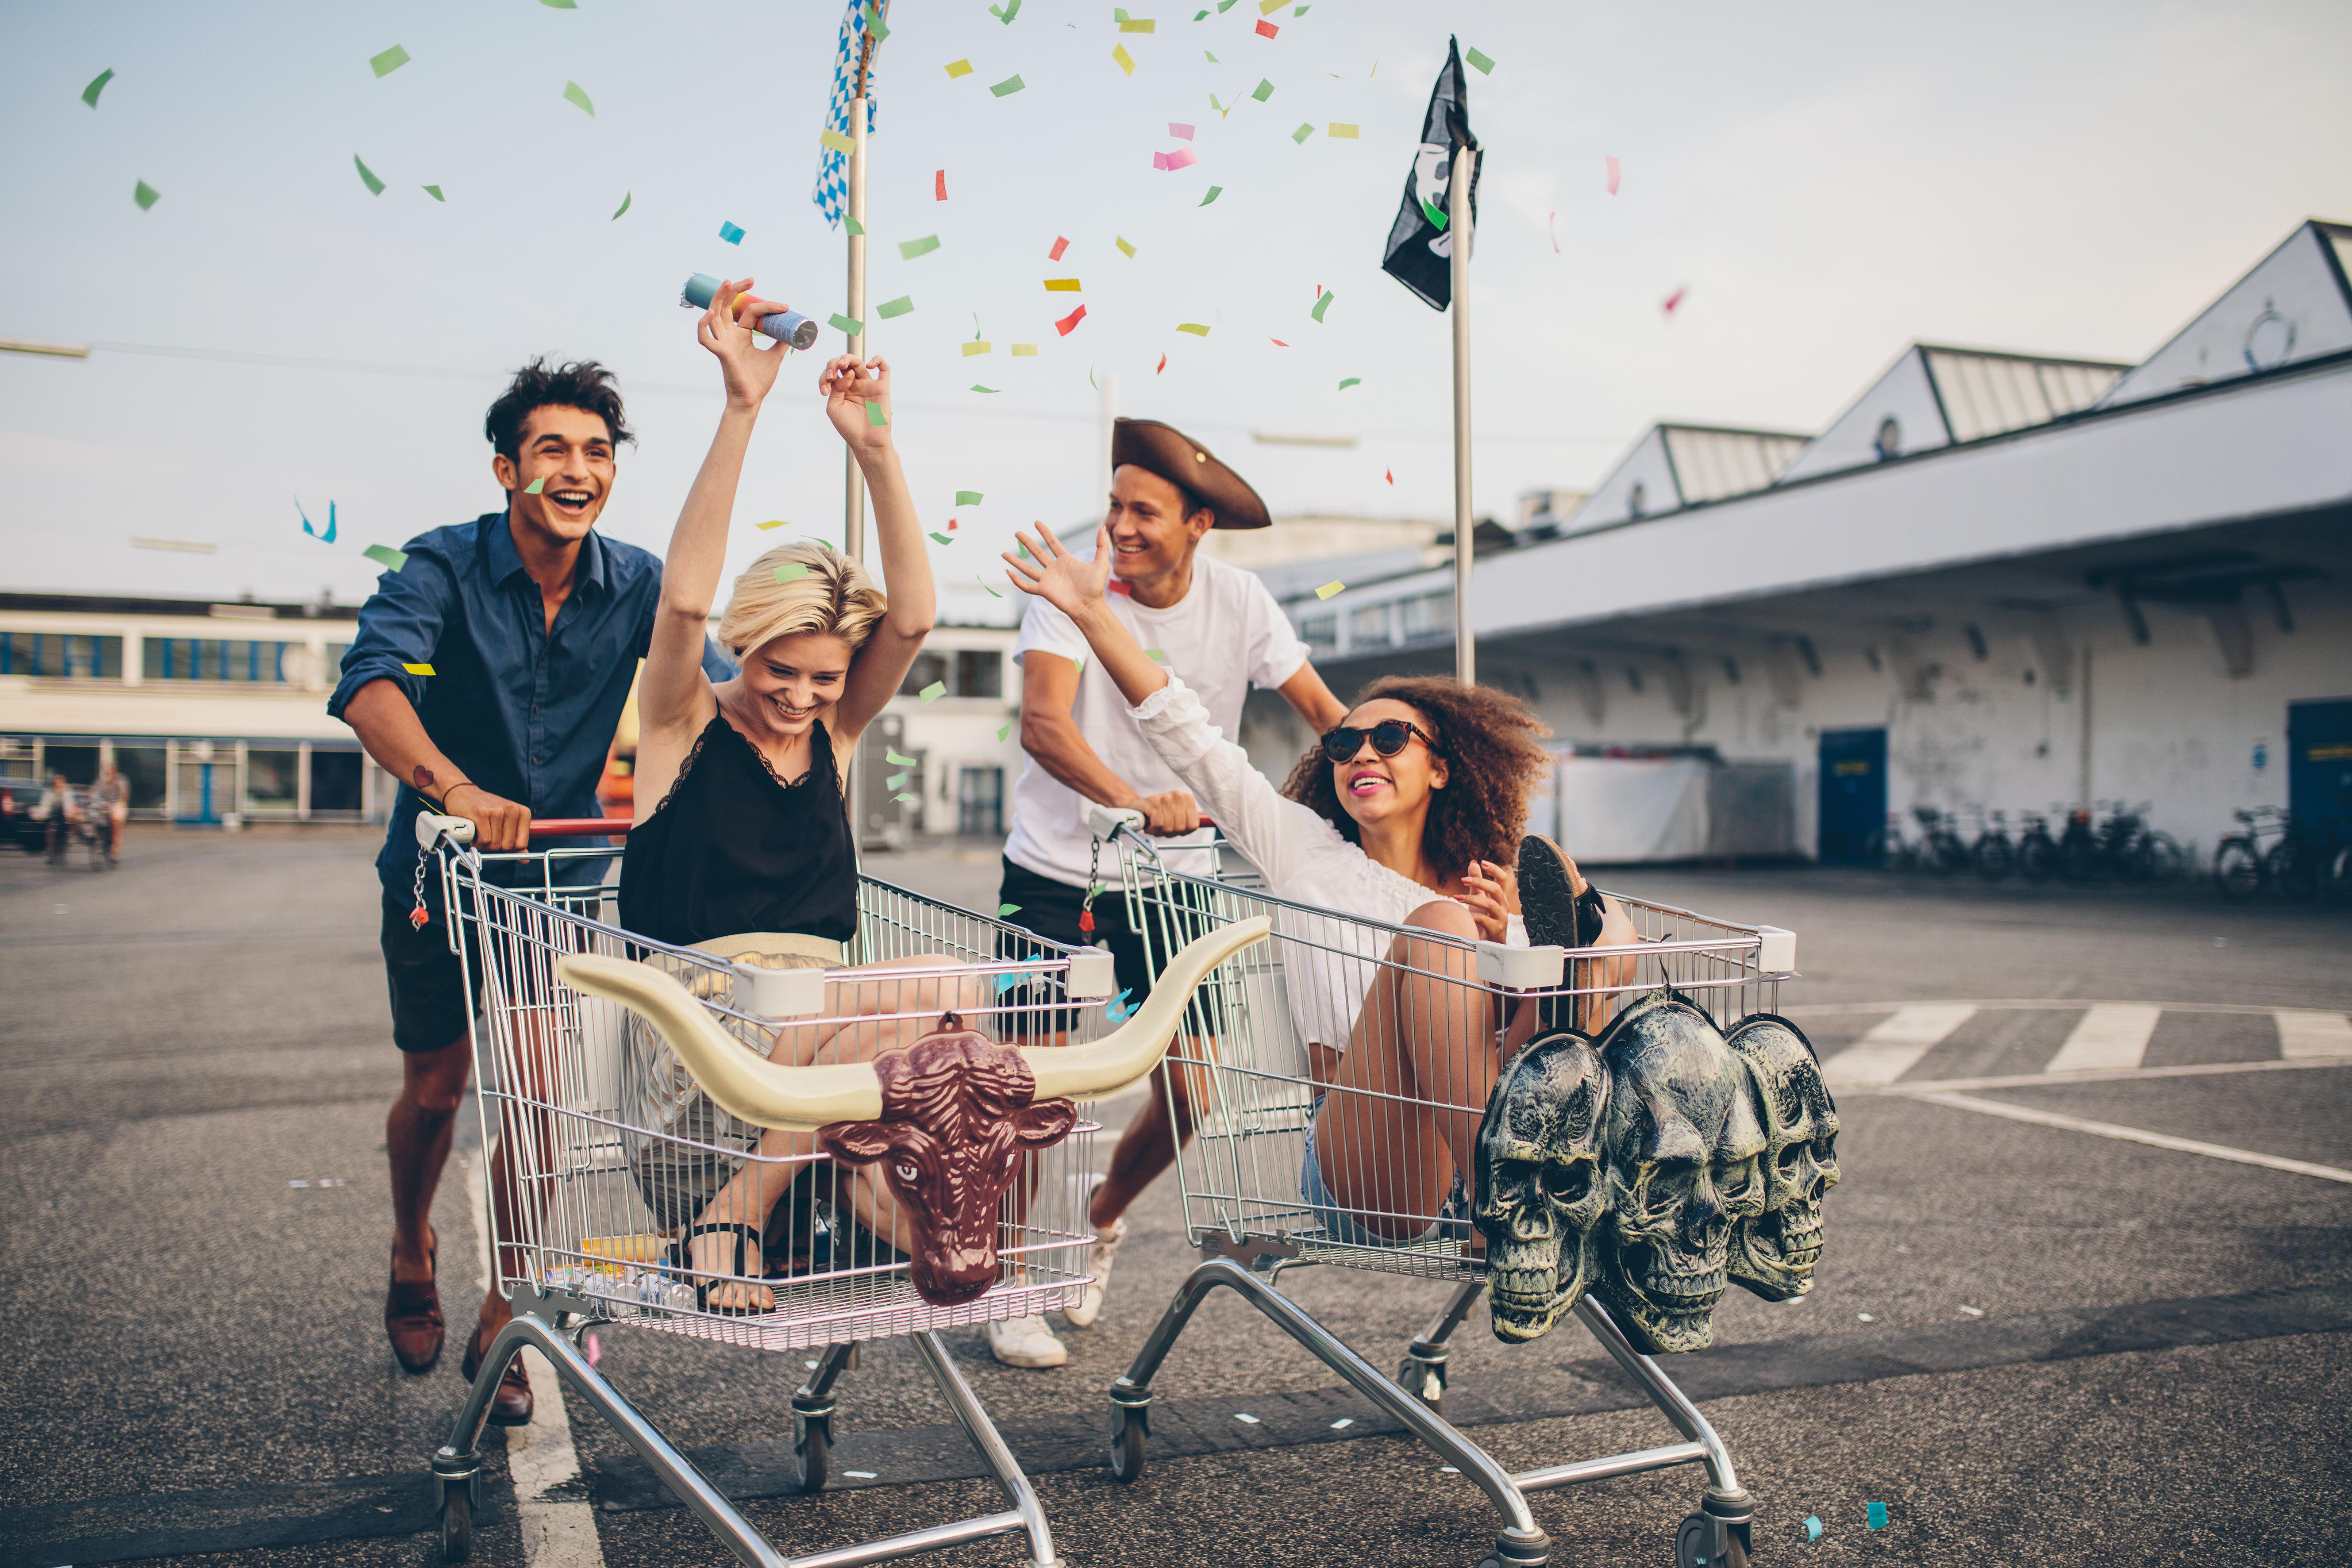 Mladi se voze u kolicima za shopping